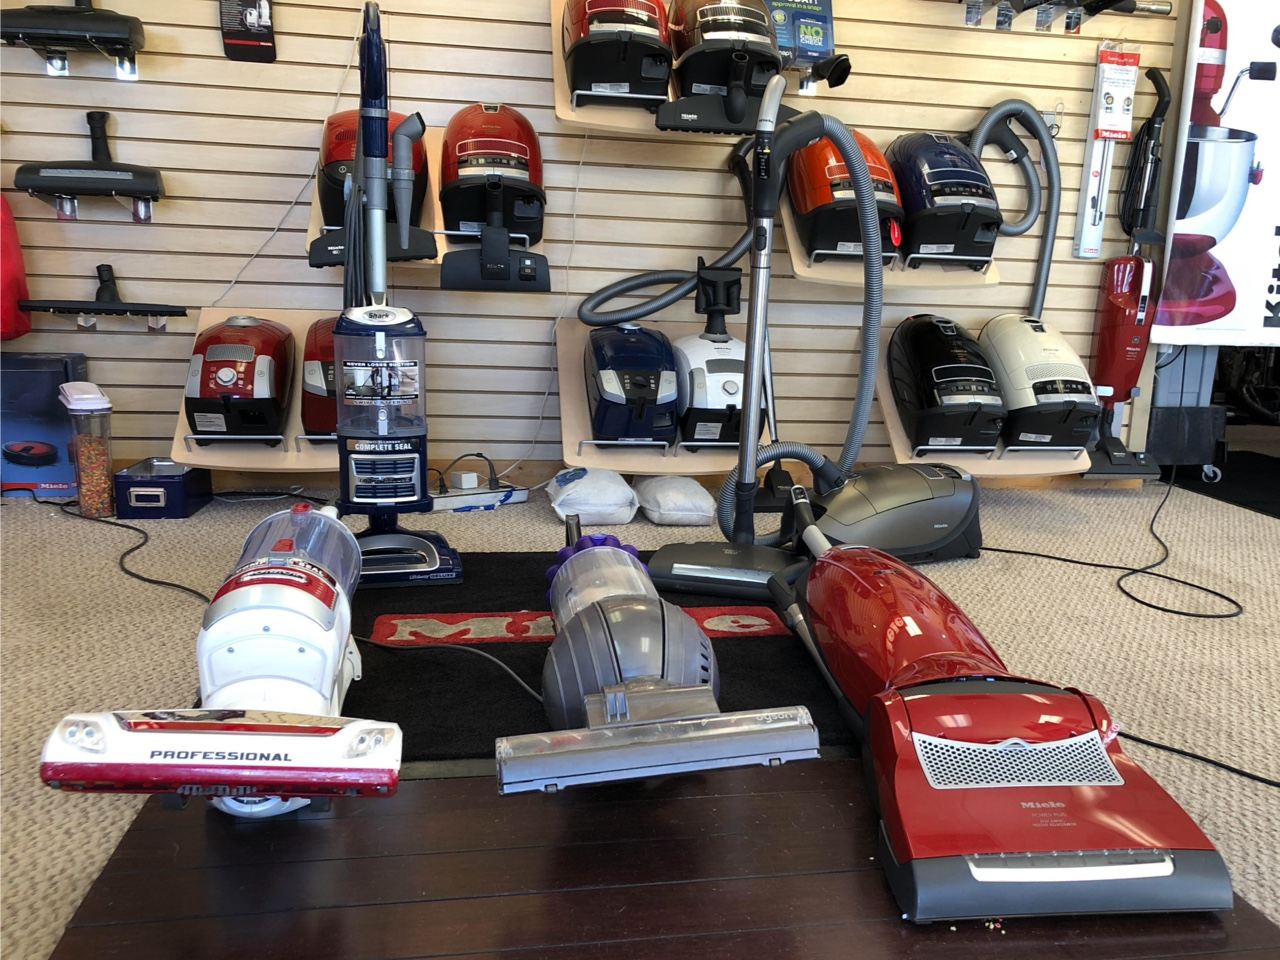 compare Miele, Dyson, and Shark vacuums